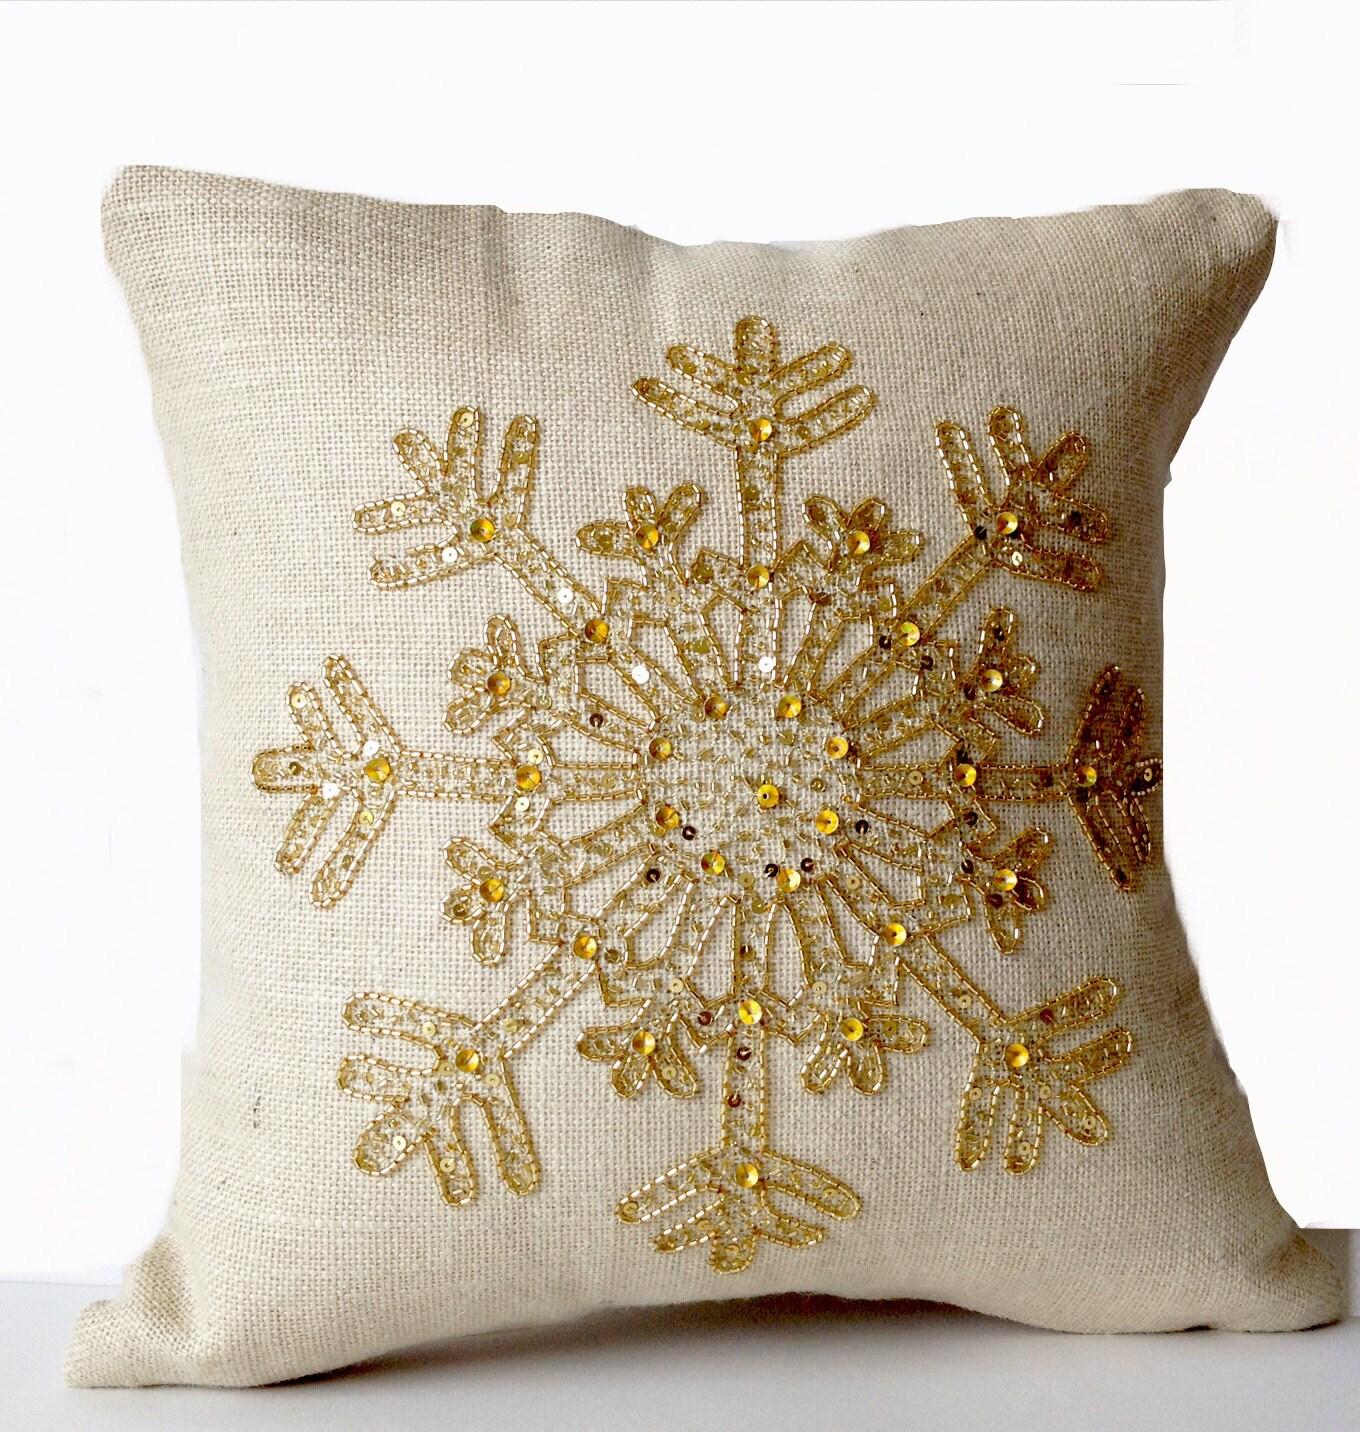 new design traveled marketplace burlap pillows stuff decorative pillow write the lane